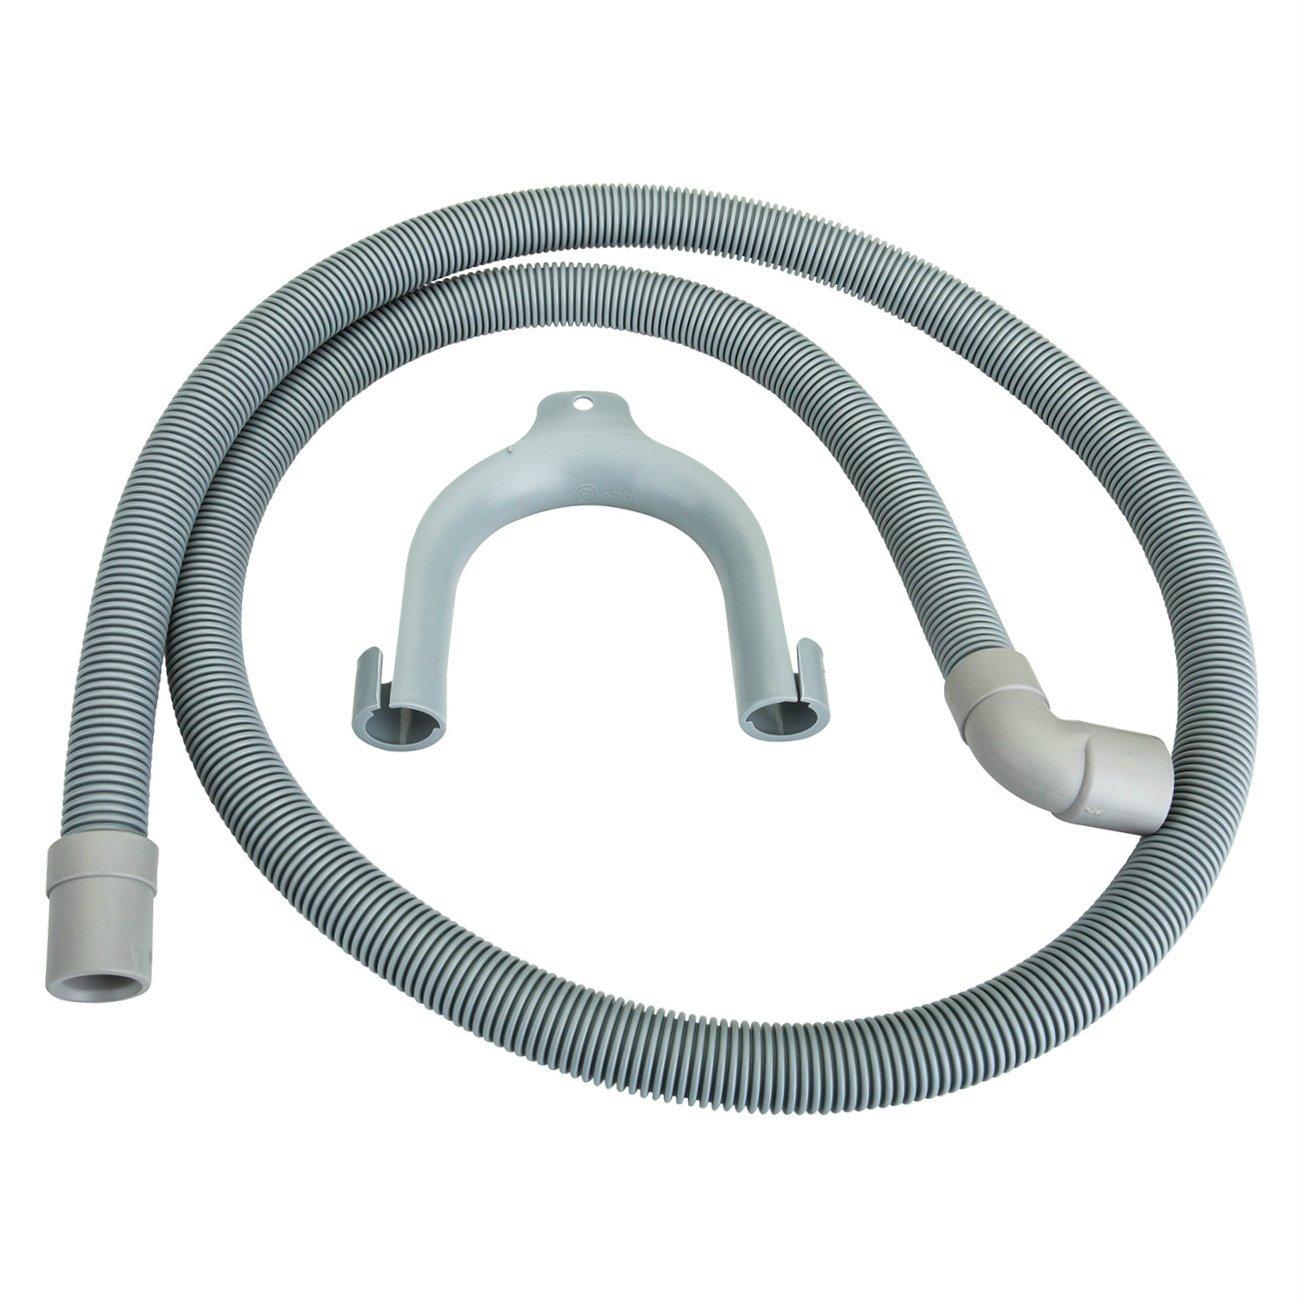 First4Spares Universal Replacement Washing Machine Waste Water Drain Hose (1.6M 19/22MM 90DEG) Qualtex